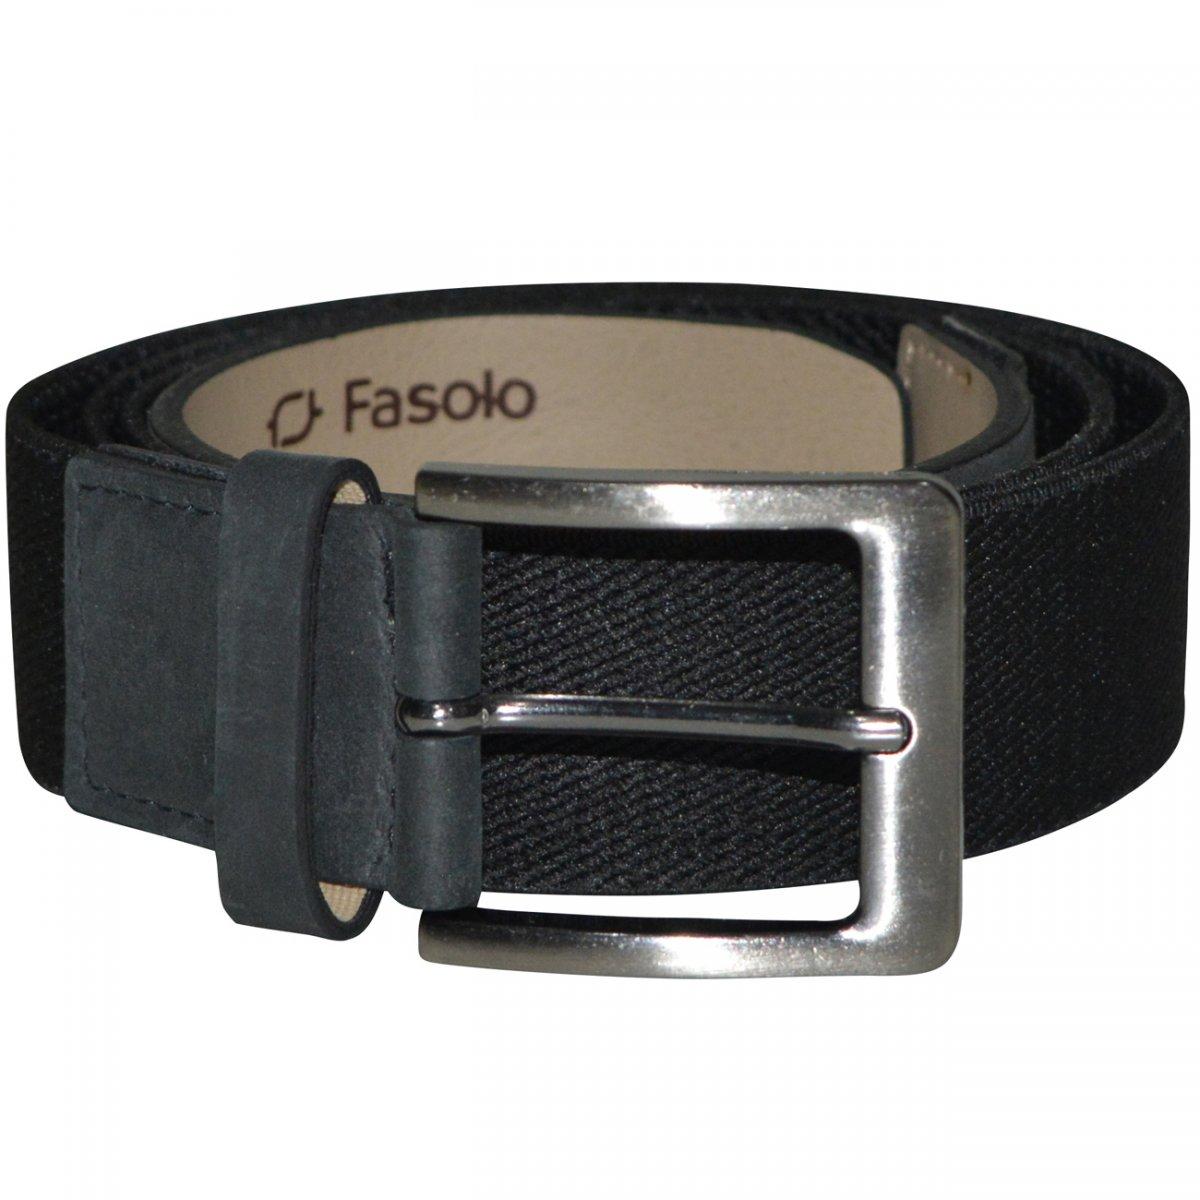 f147d712c504a Cinto Fasolo G188221 G188221751 - Preto - Chuteira Nike